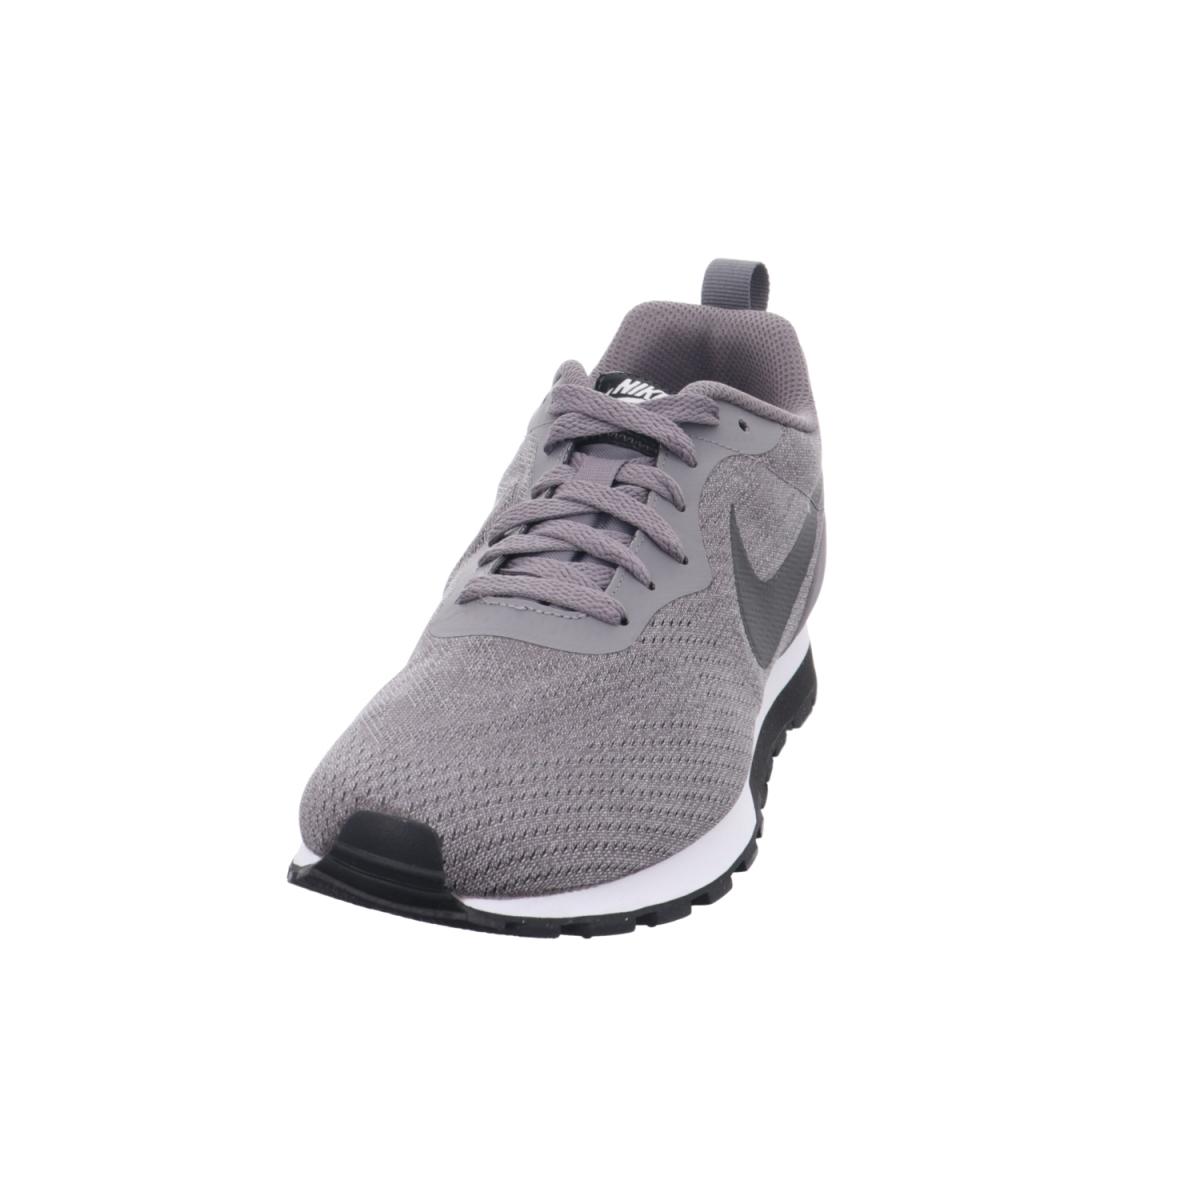 Nike | 916774 003 | Hillenhinrichs